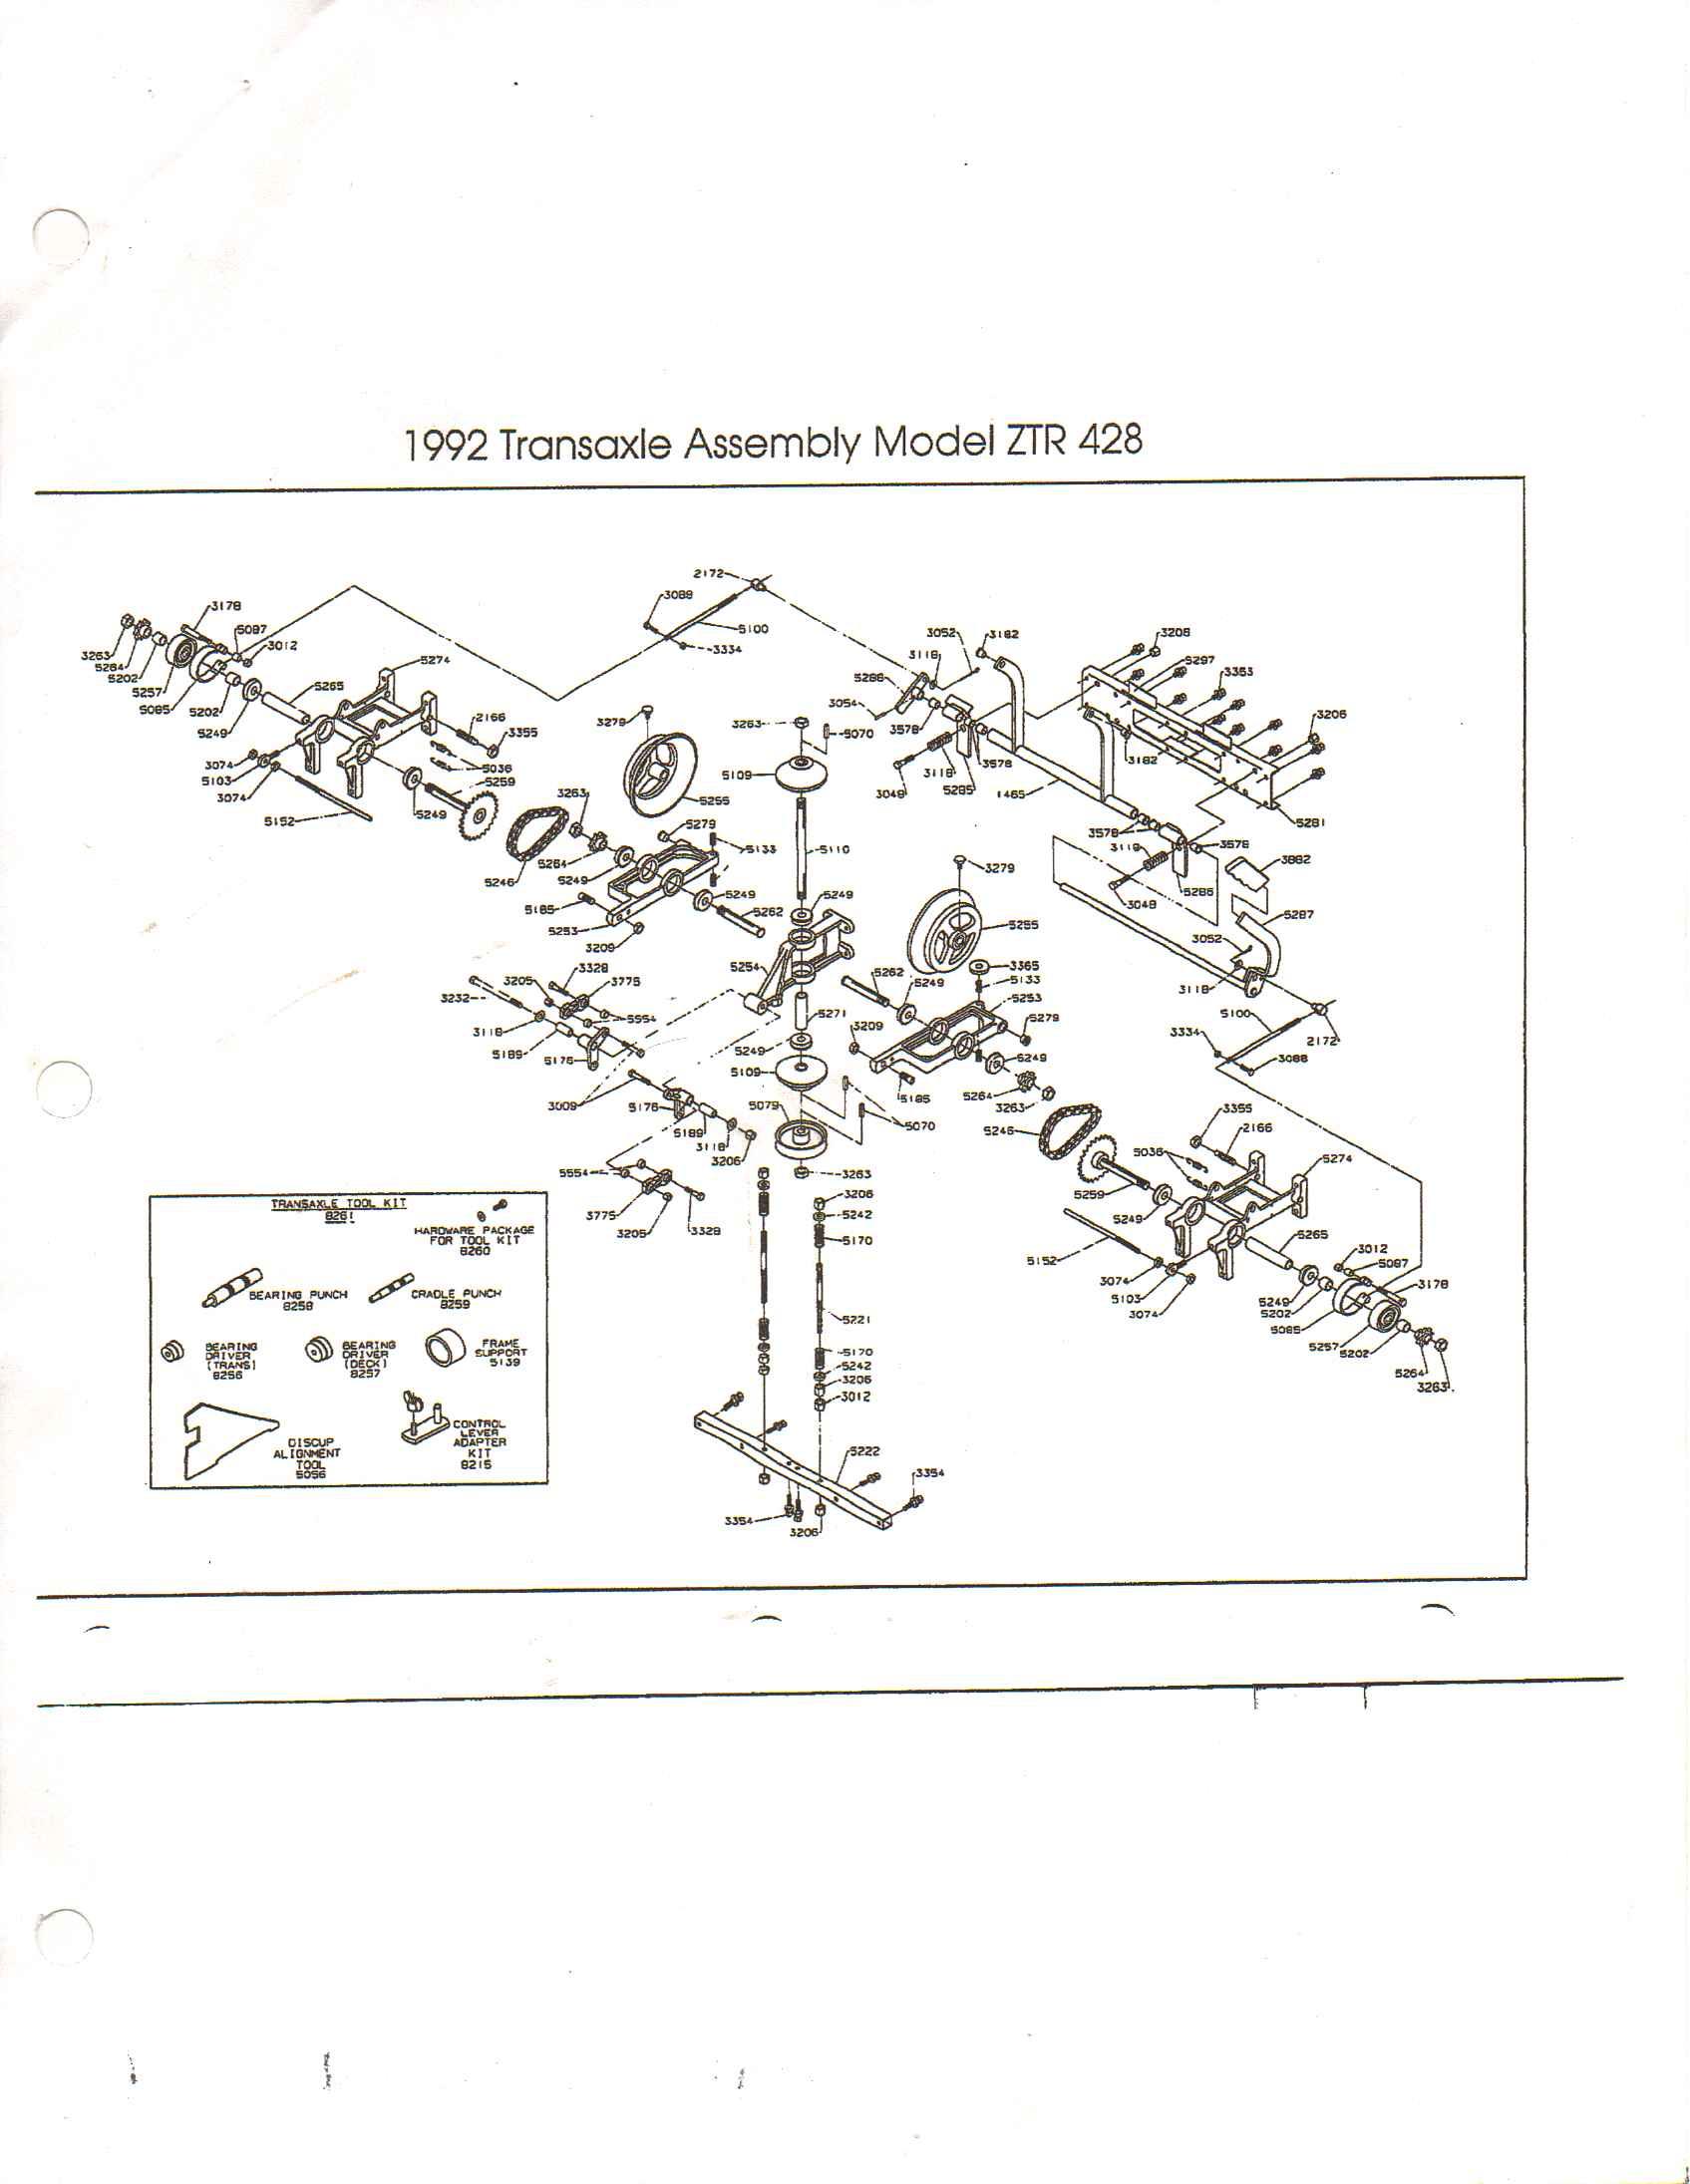 5b0dc07e-ed09-42a1-b8ba-de5e6d2f9518_Dixon Adjustments2.jpg